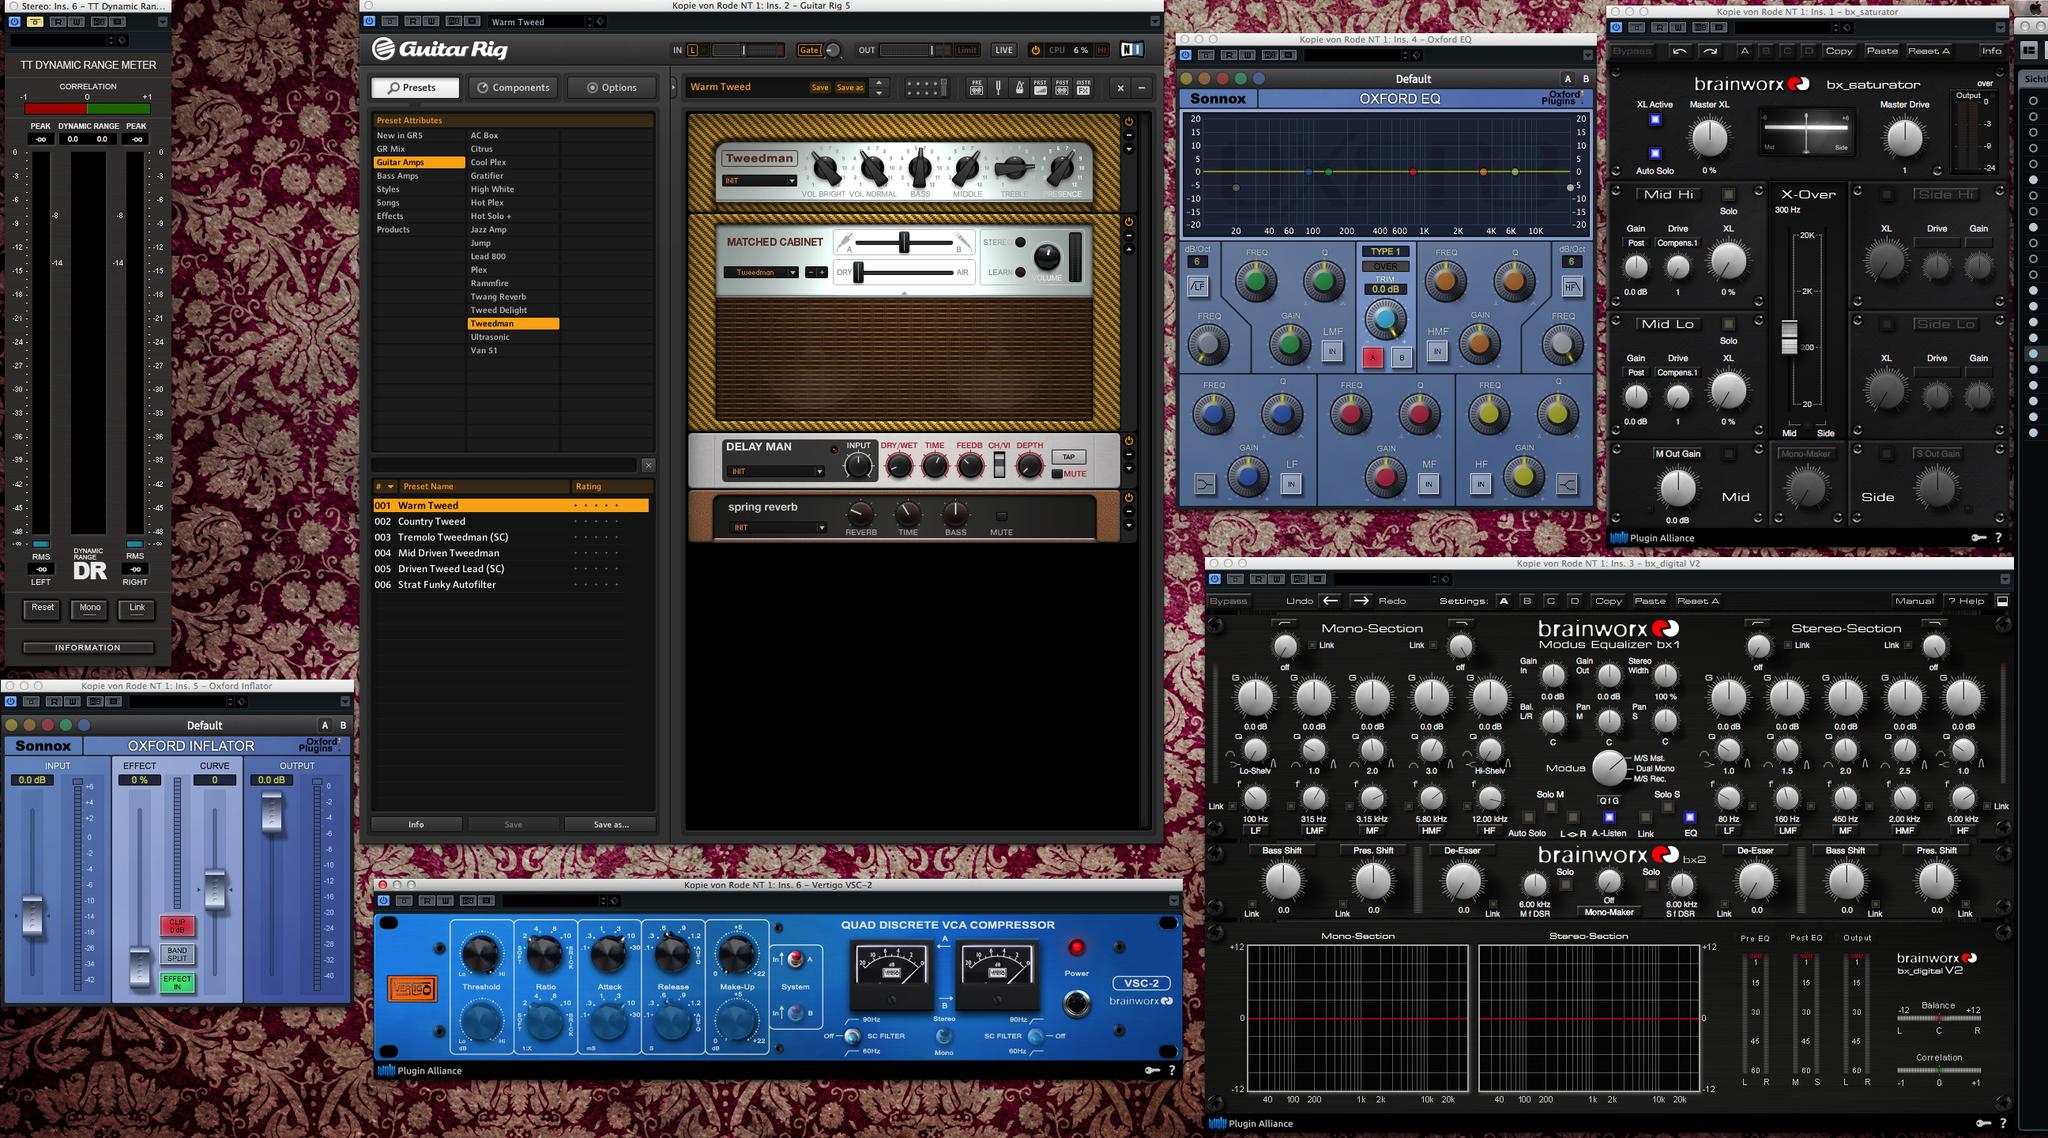 Plugin's Sonnox Oxford, Brainworx, Guitar Rig, VSC-2 ...